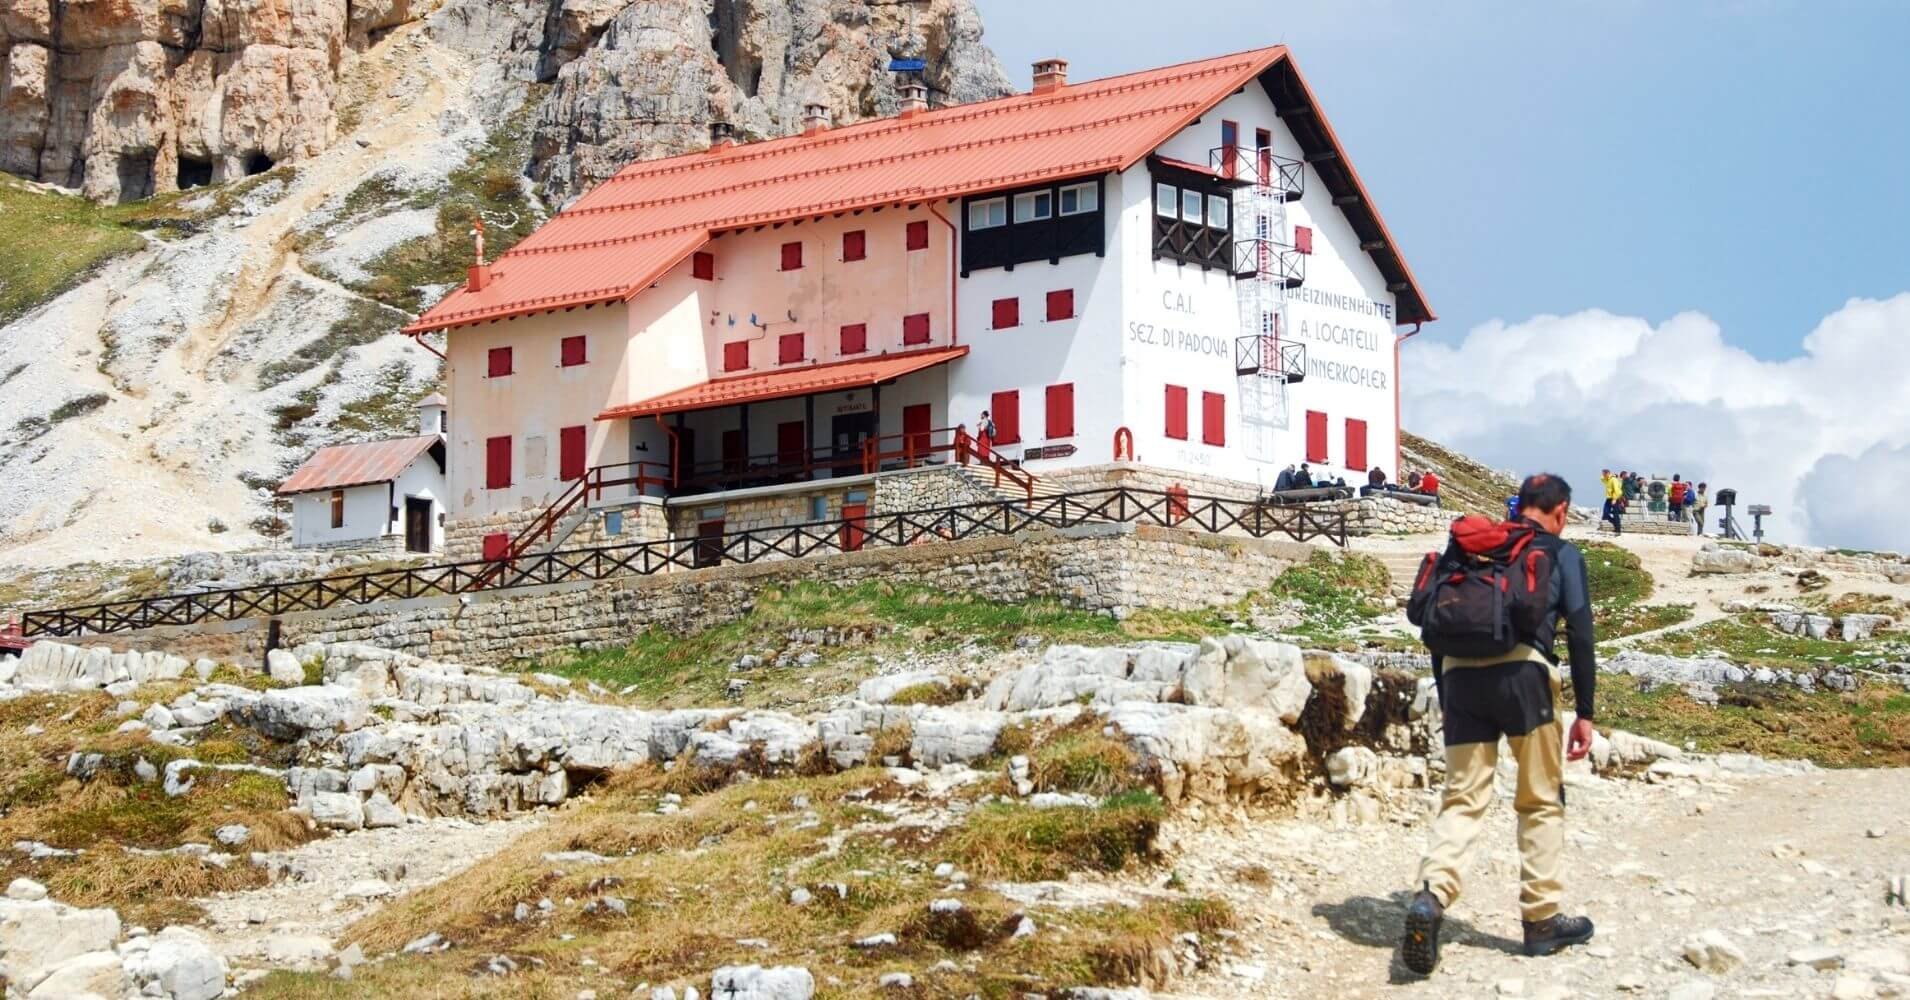 Refugio de Locateli. Tres Cimas di Lavaredo. Alpes Dolomitas. Belluno. Véneto. Italia.